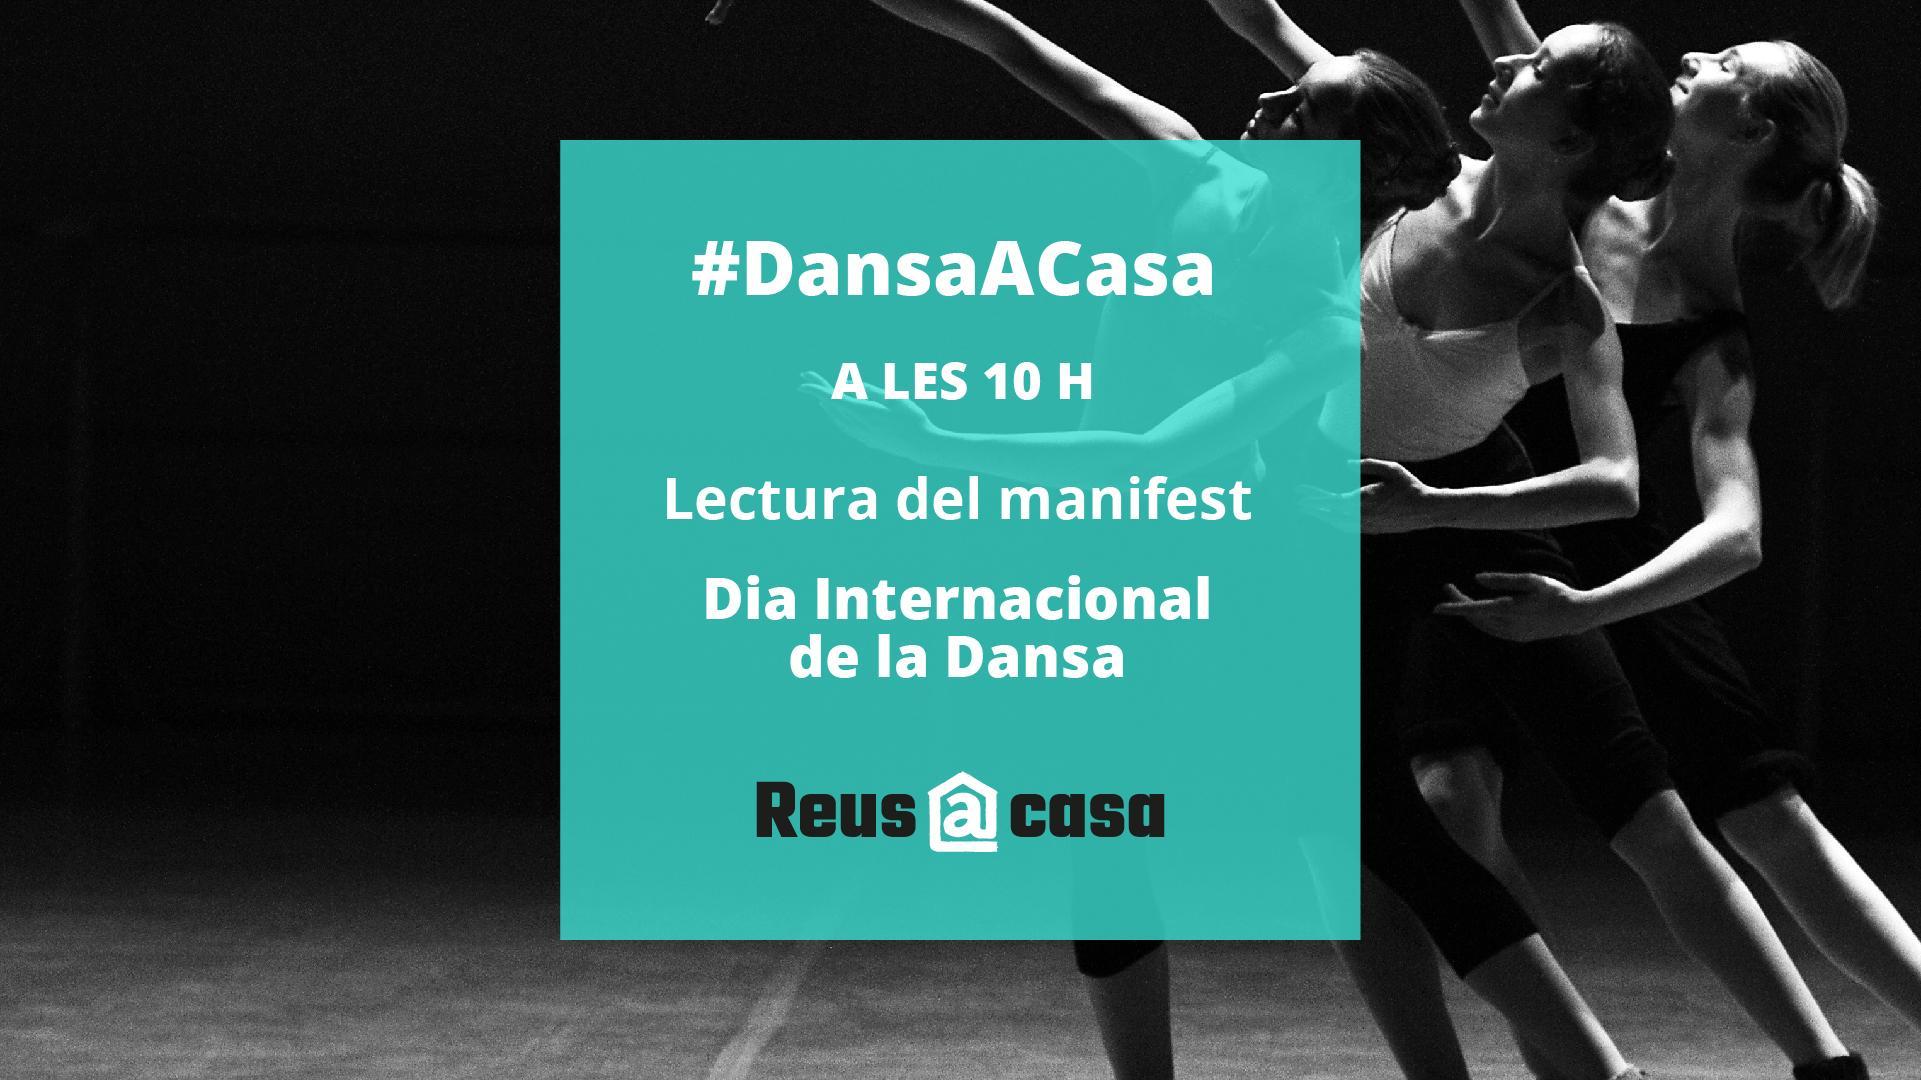 DansaACasa: Lectura del manifest